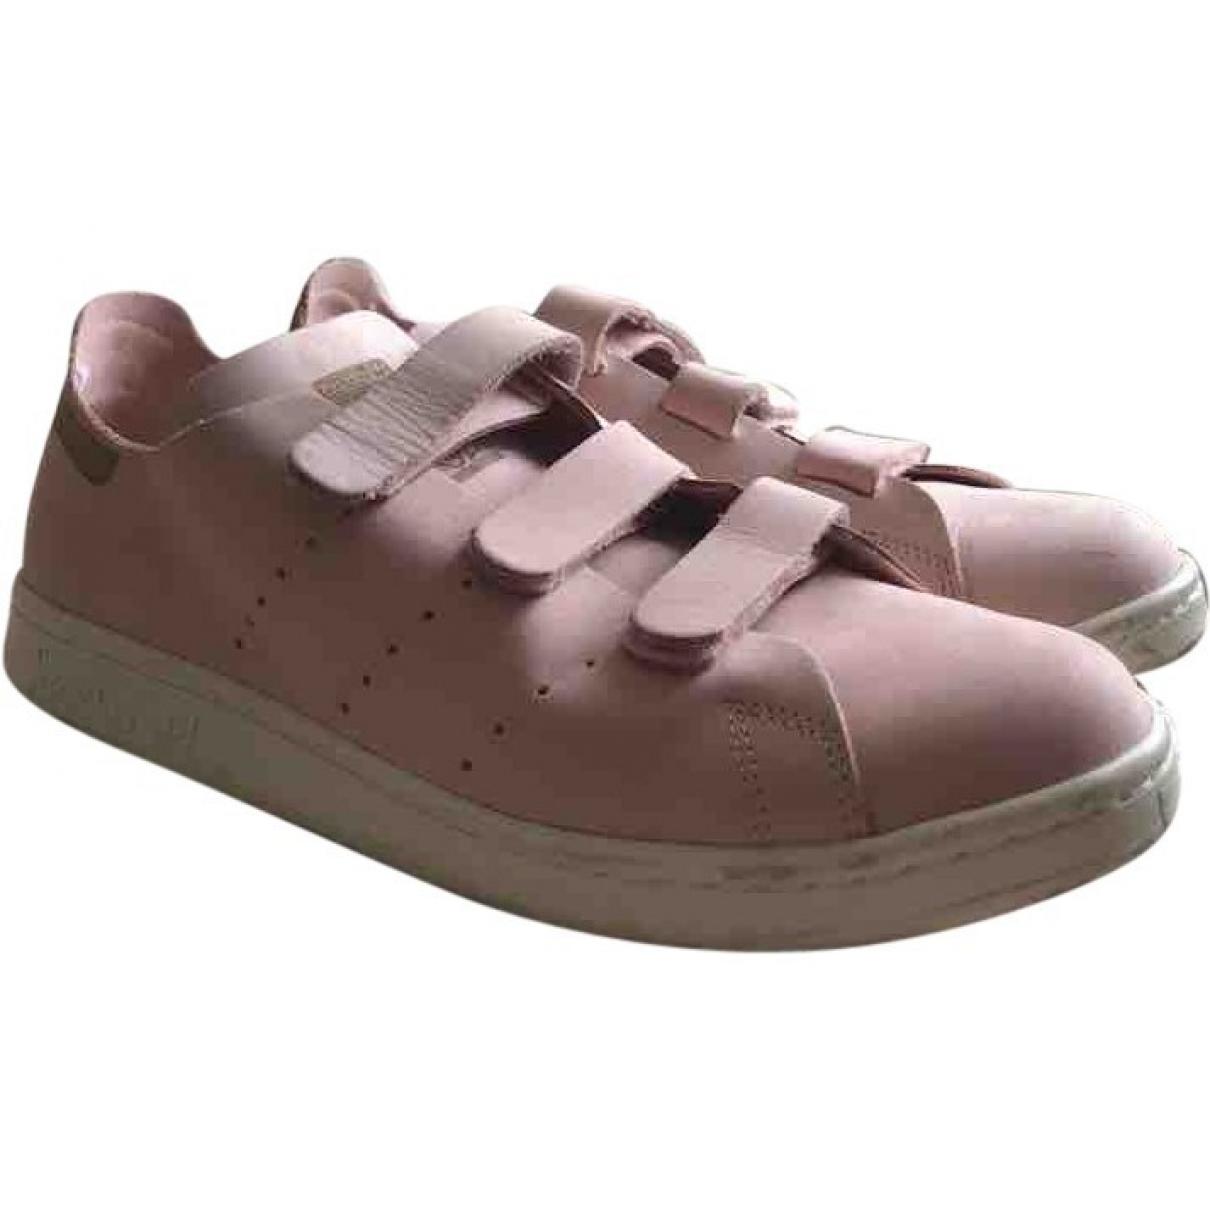 Adidas - Baskets Stan Smith pour homme en cuir - rose